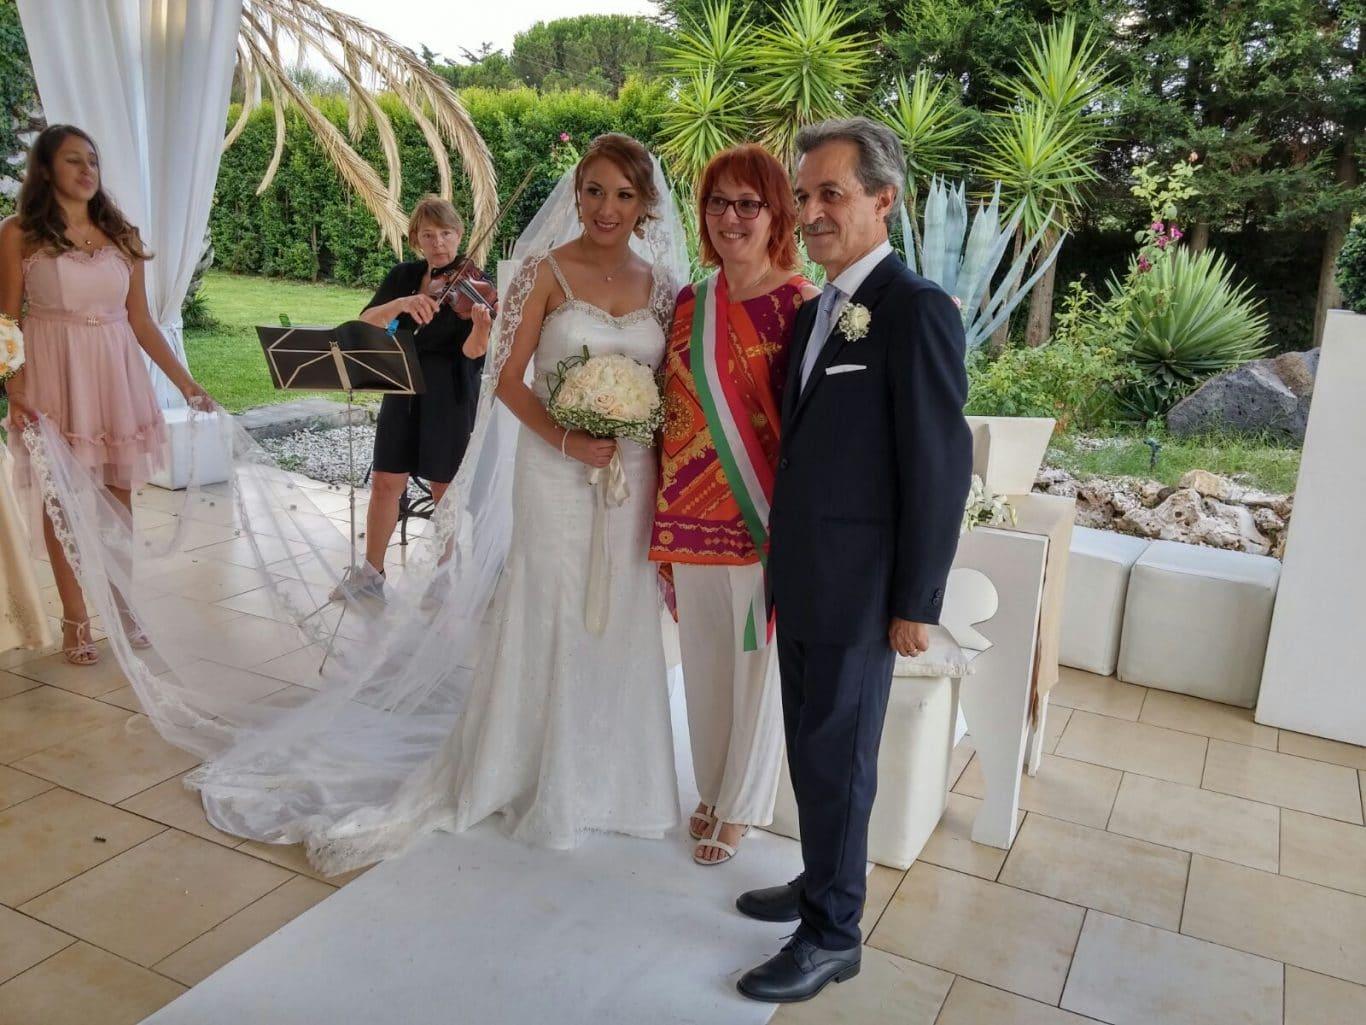 Celebrante Matrimonio Simbolico Varese : Celebrante matrimoni area events